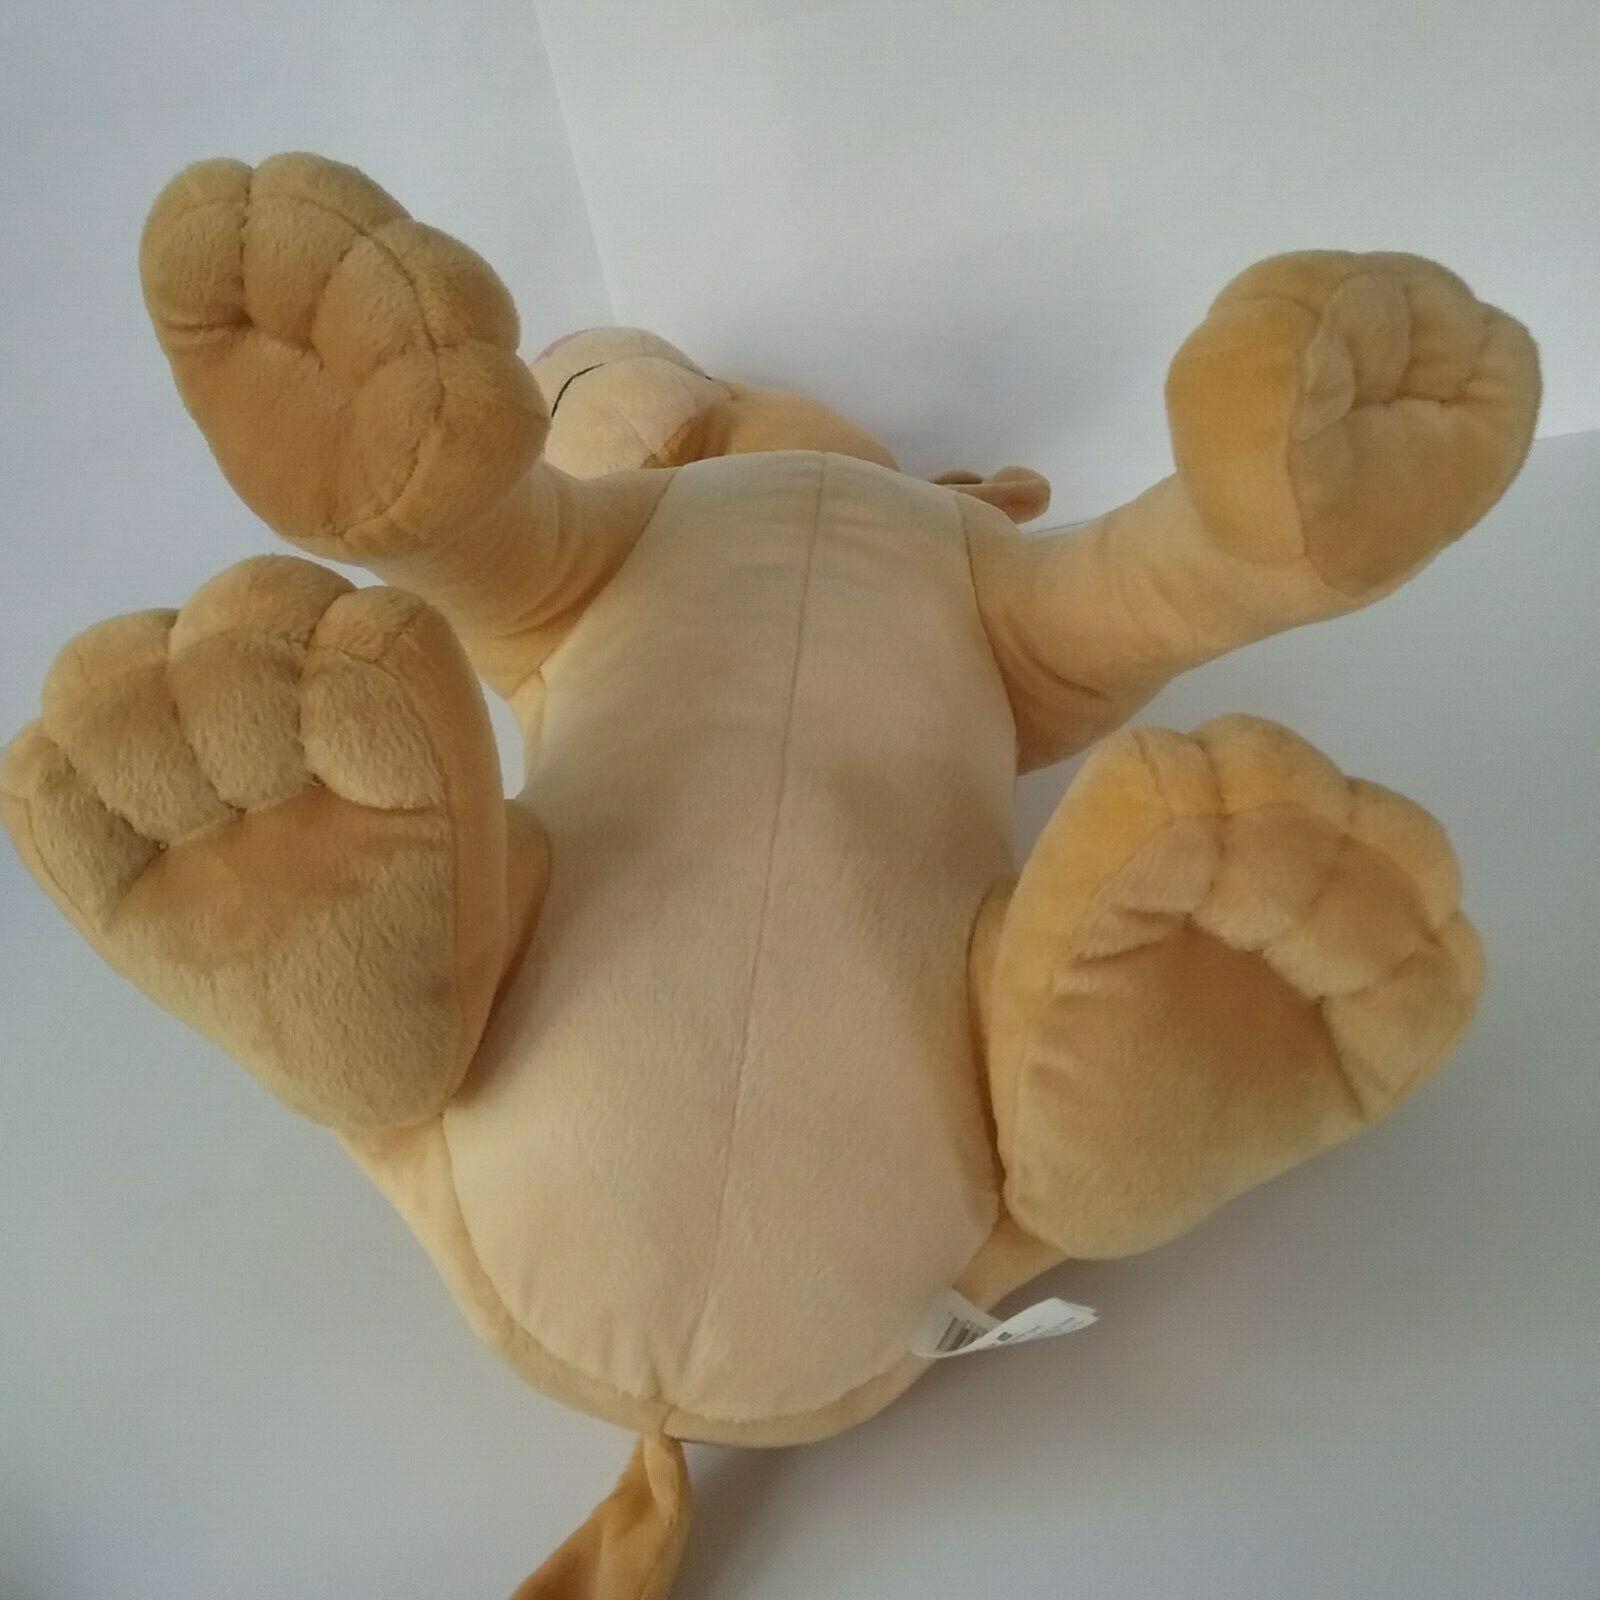 "*Large* Nala Disney 'The Lion King' Cub Soft Plush Stuffed Animal Doll Toy 18"""